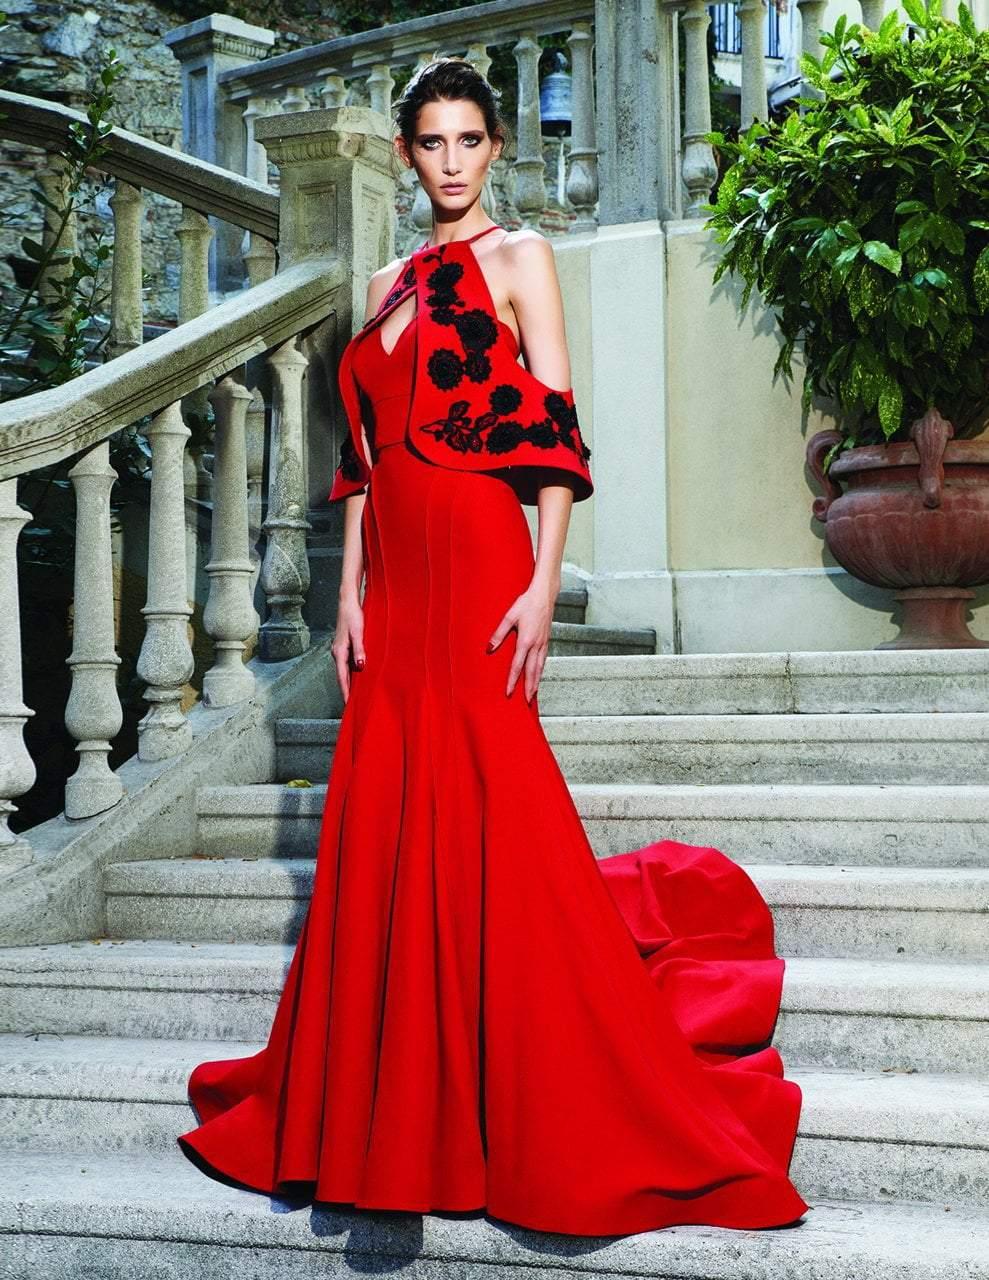 MNM Couture - Floral Embellished Trumpet Dress N0141